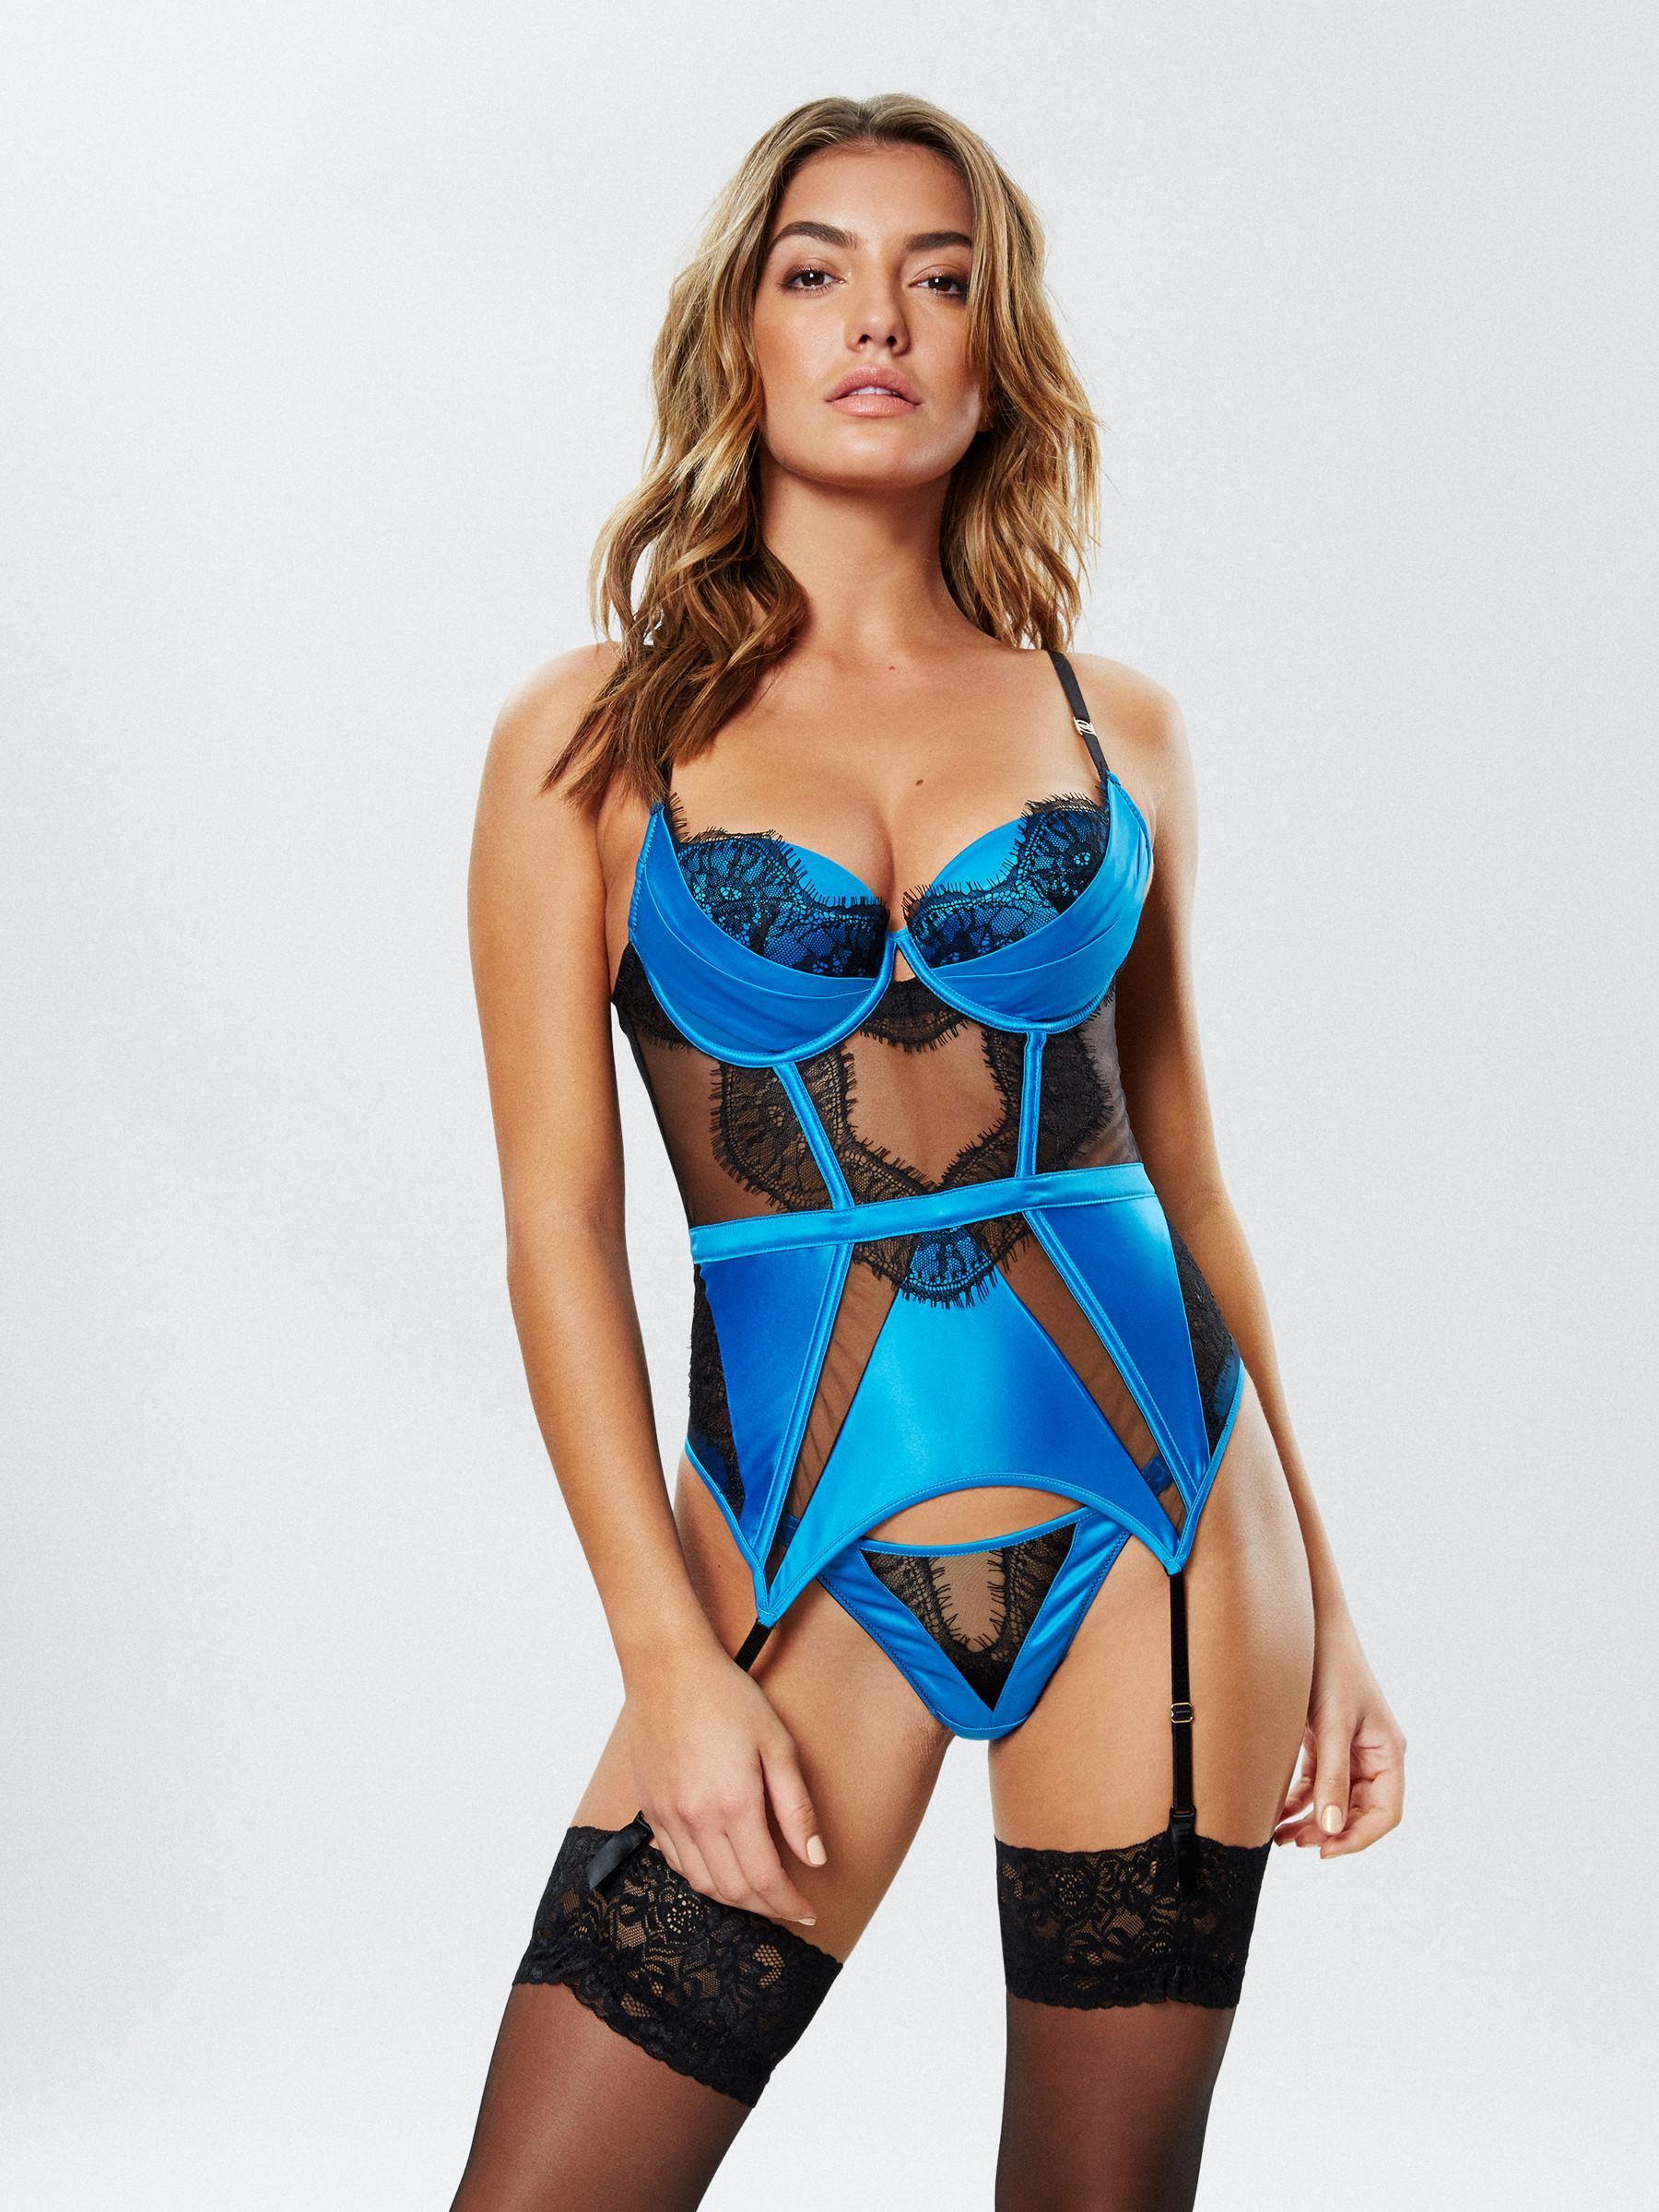 5fe3810324c7d Details about Ann Summers Womens Adalicia Basque Satin Underwire Sexy  Lingerie Underwear